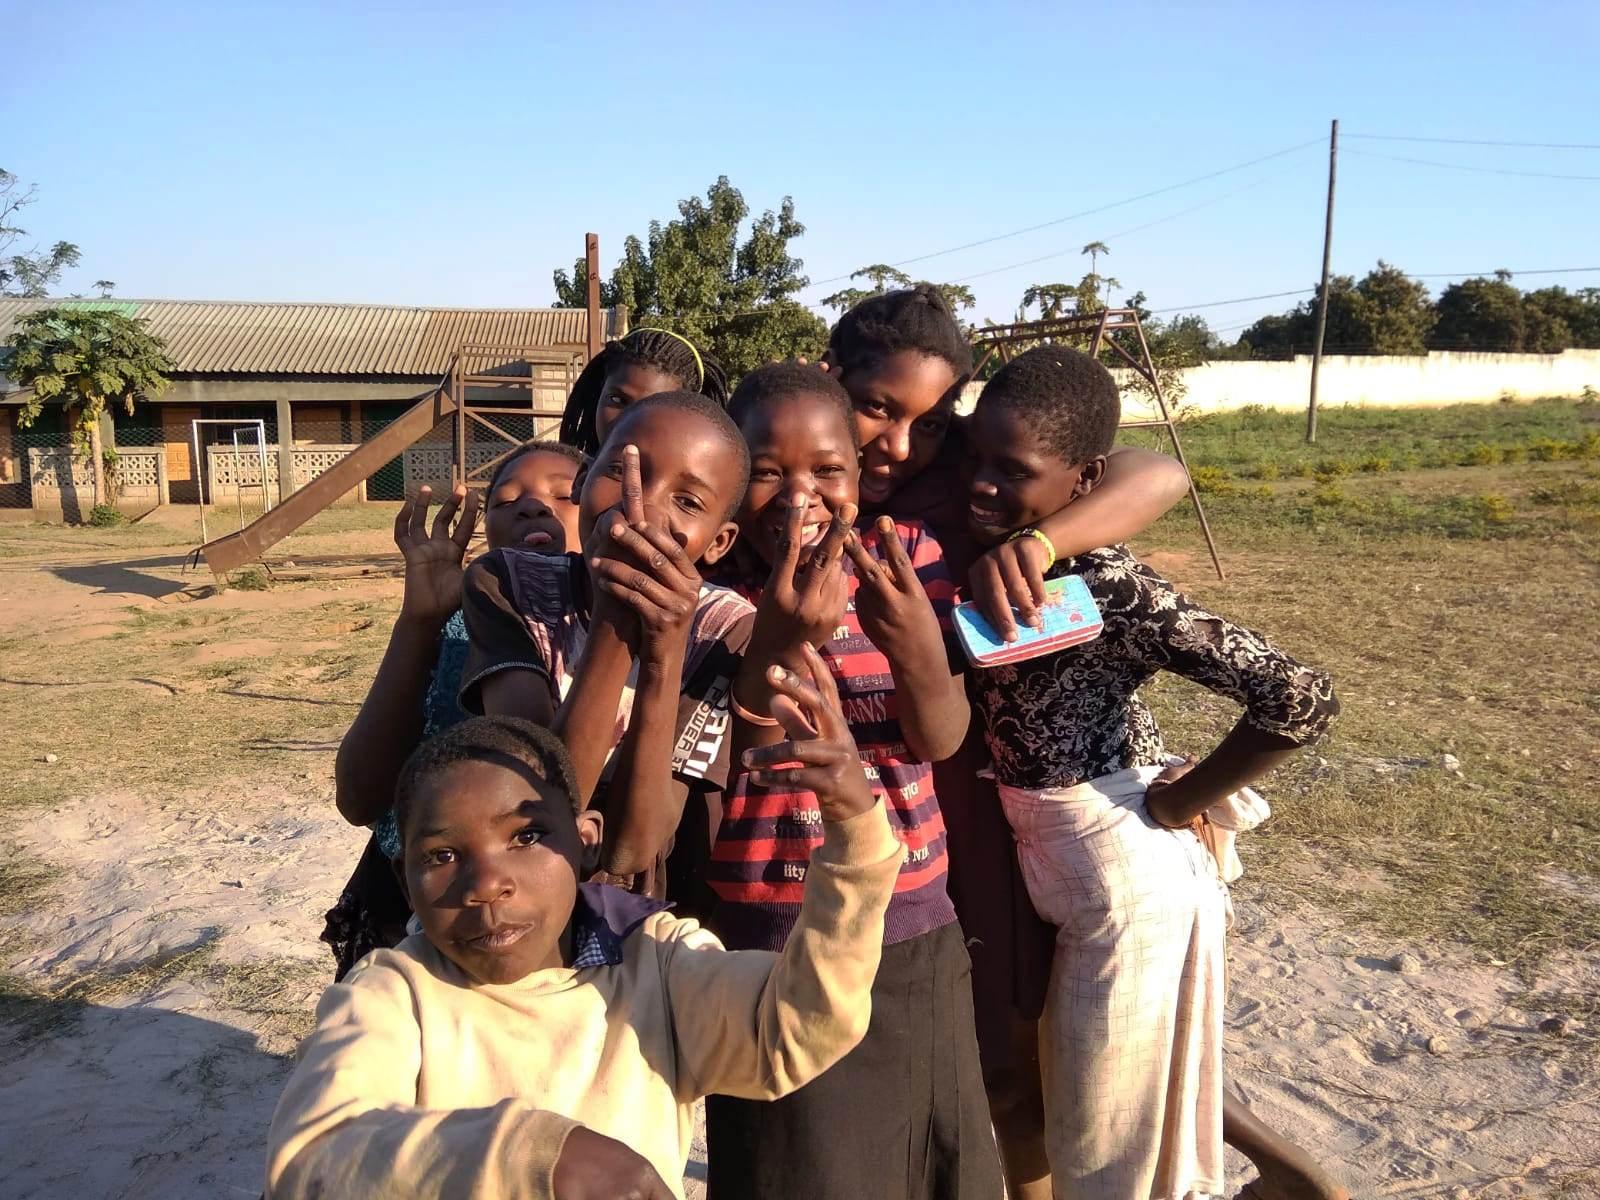 juventud_cooperante_mozambique_01.jpg